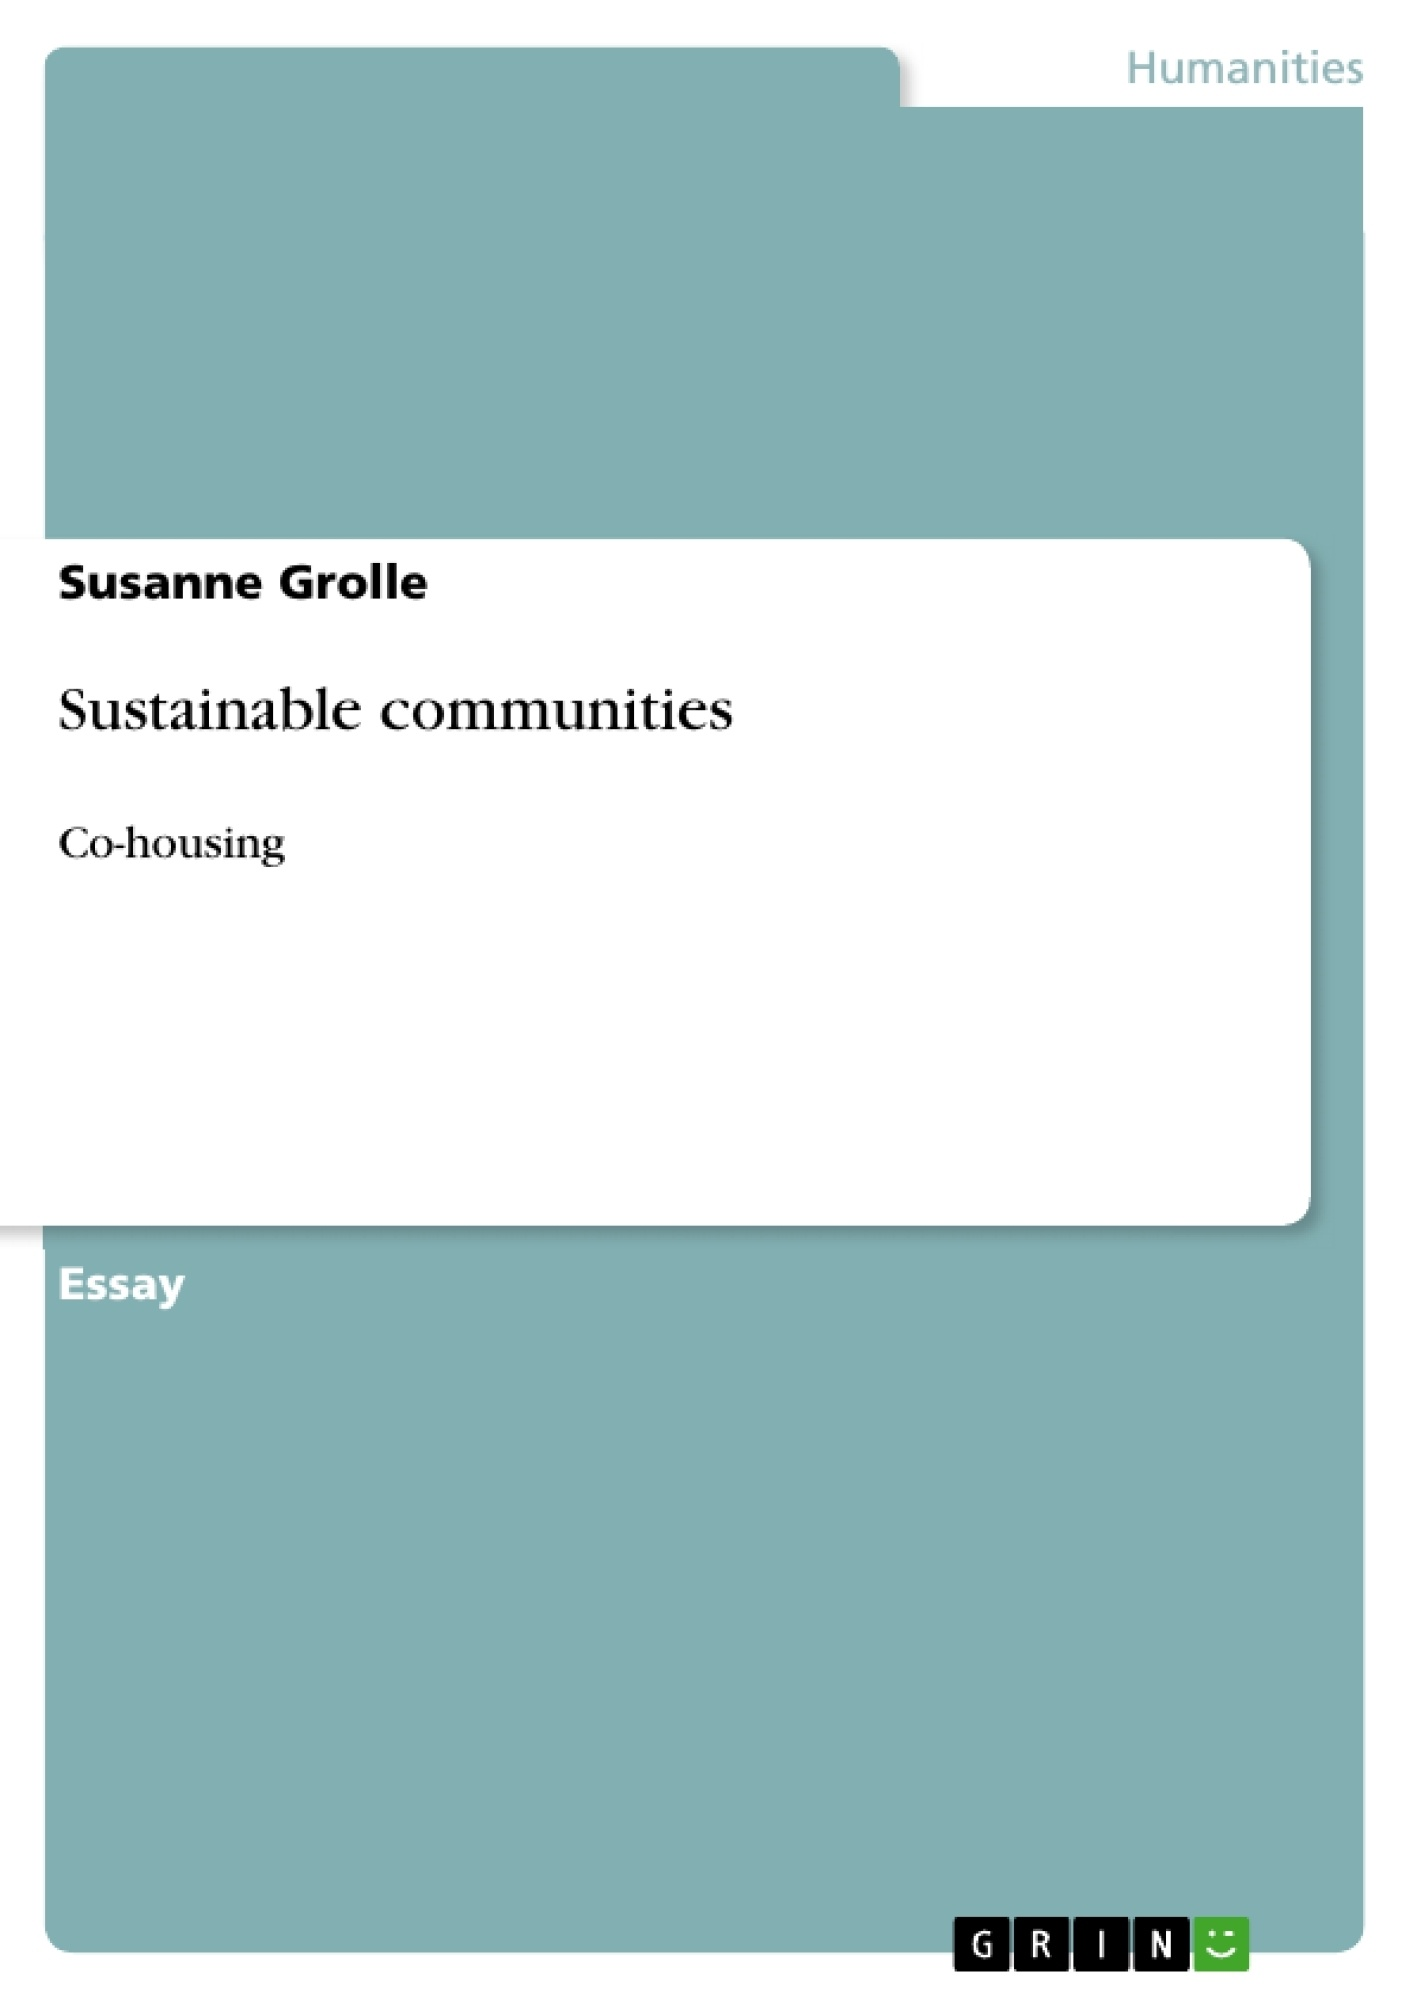 Title: Sustainable communities